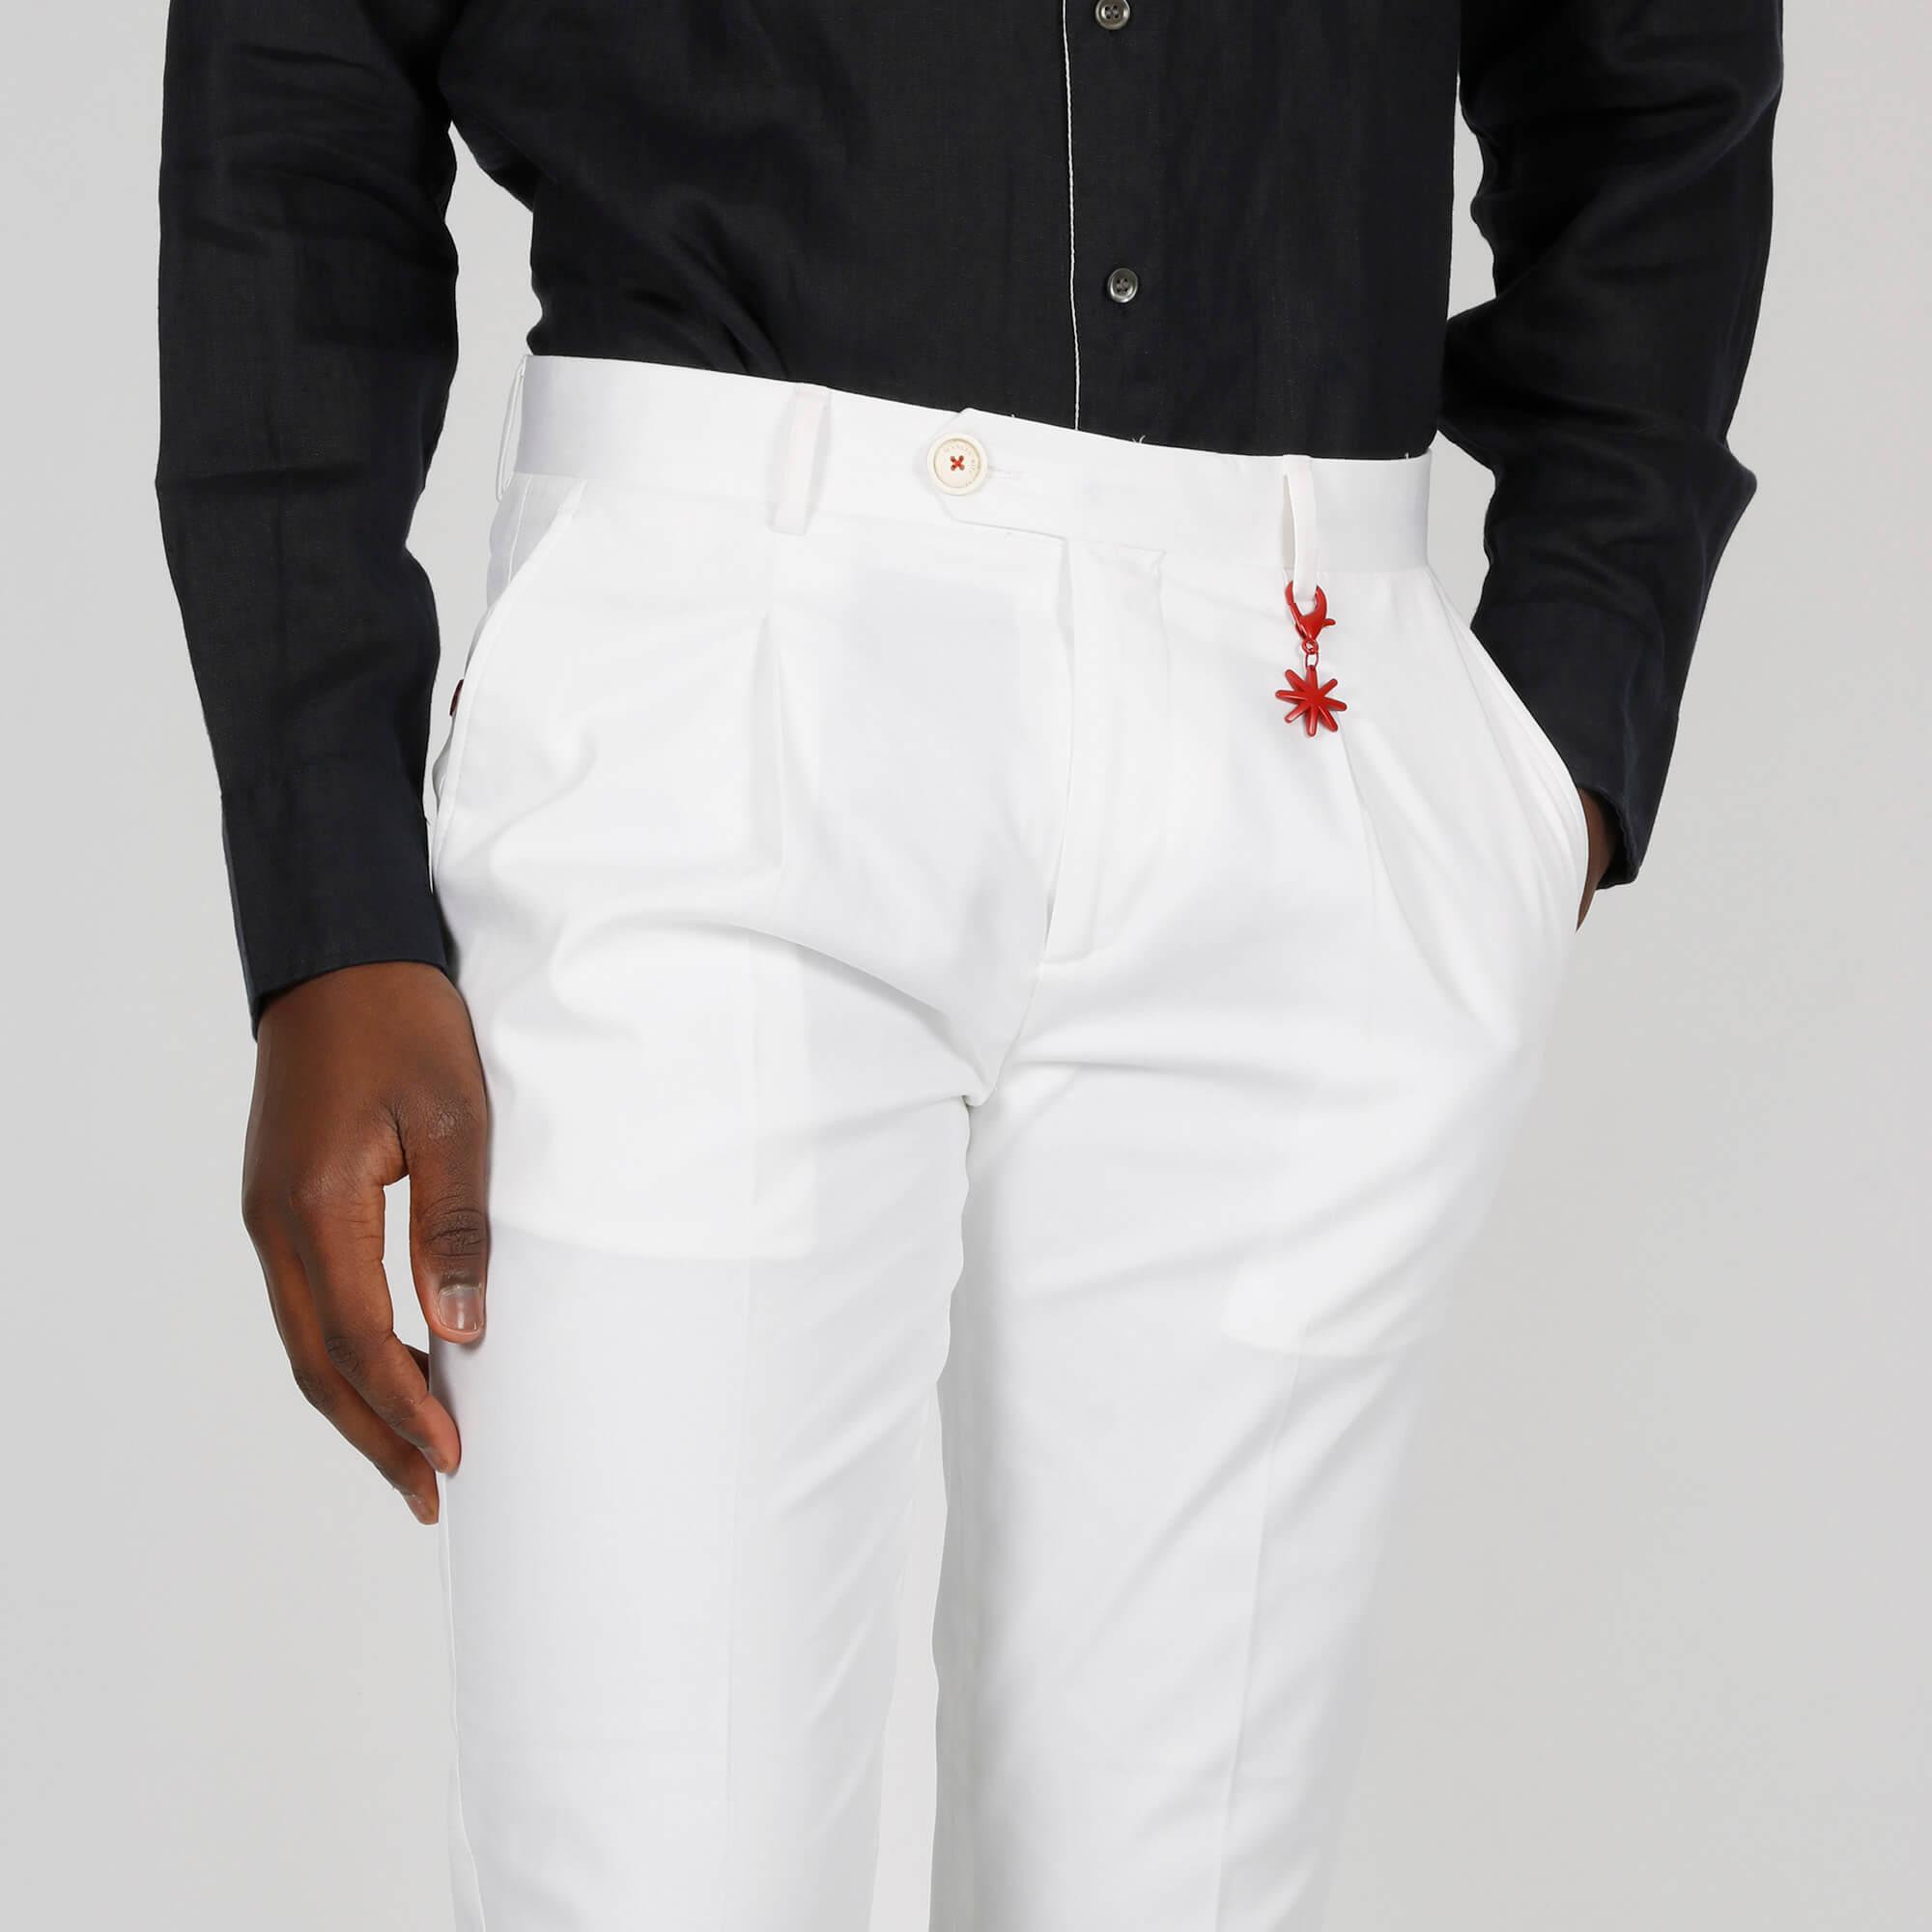 Pantalone tasca america con pences - Bianco